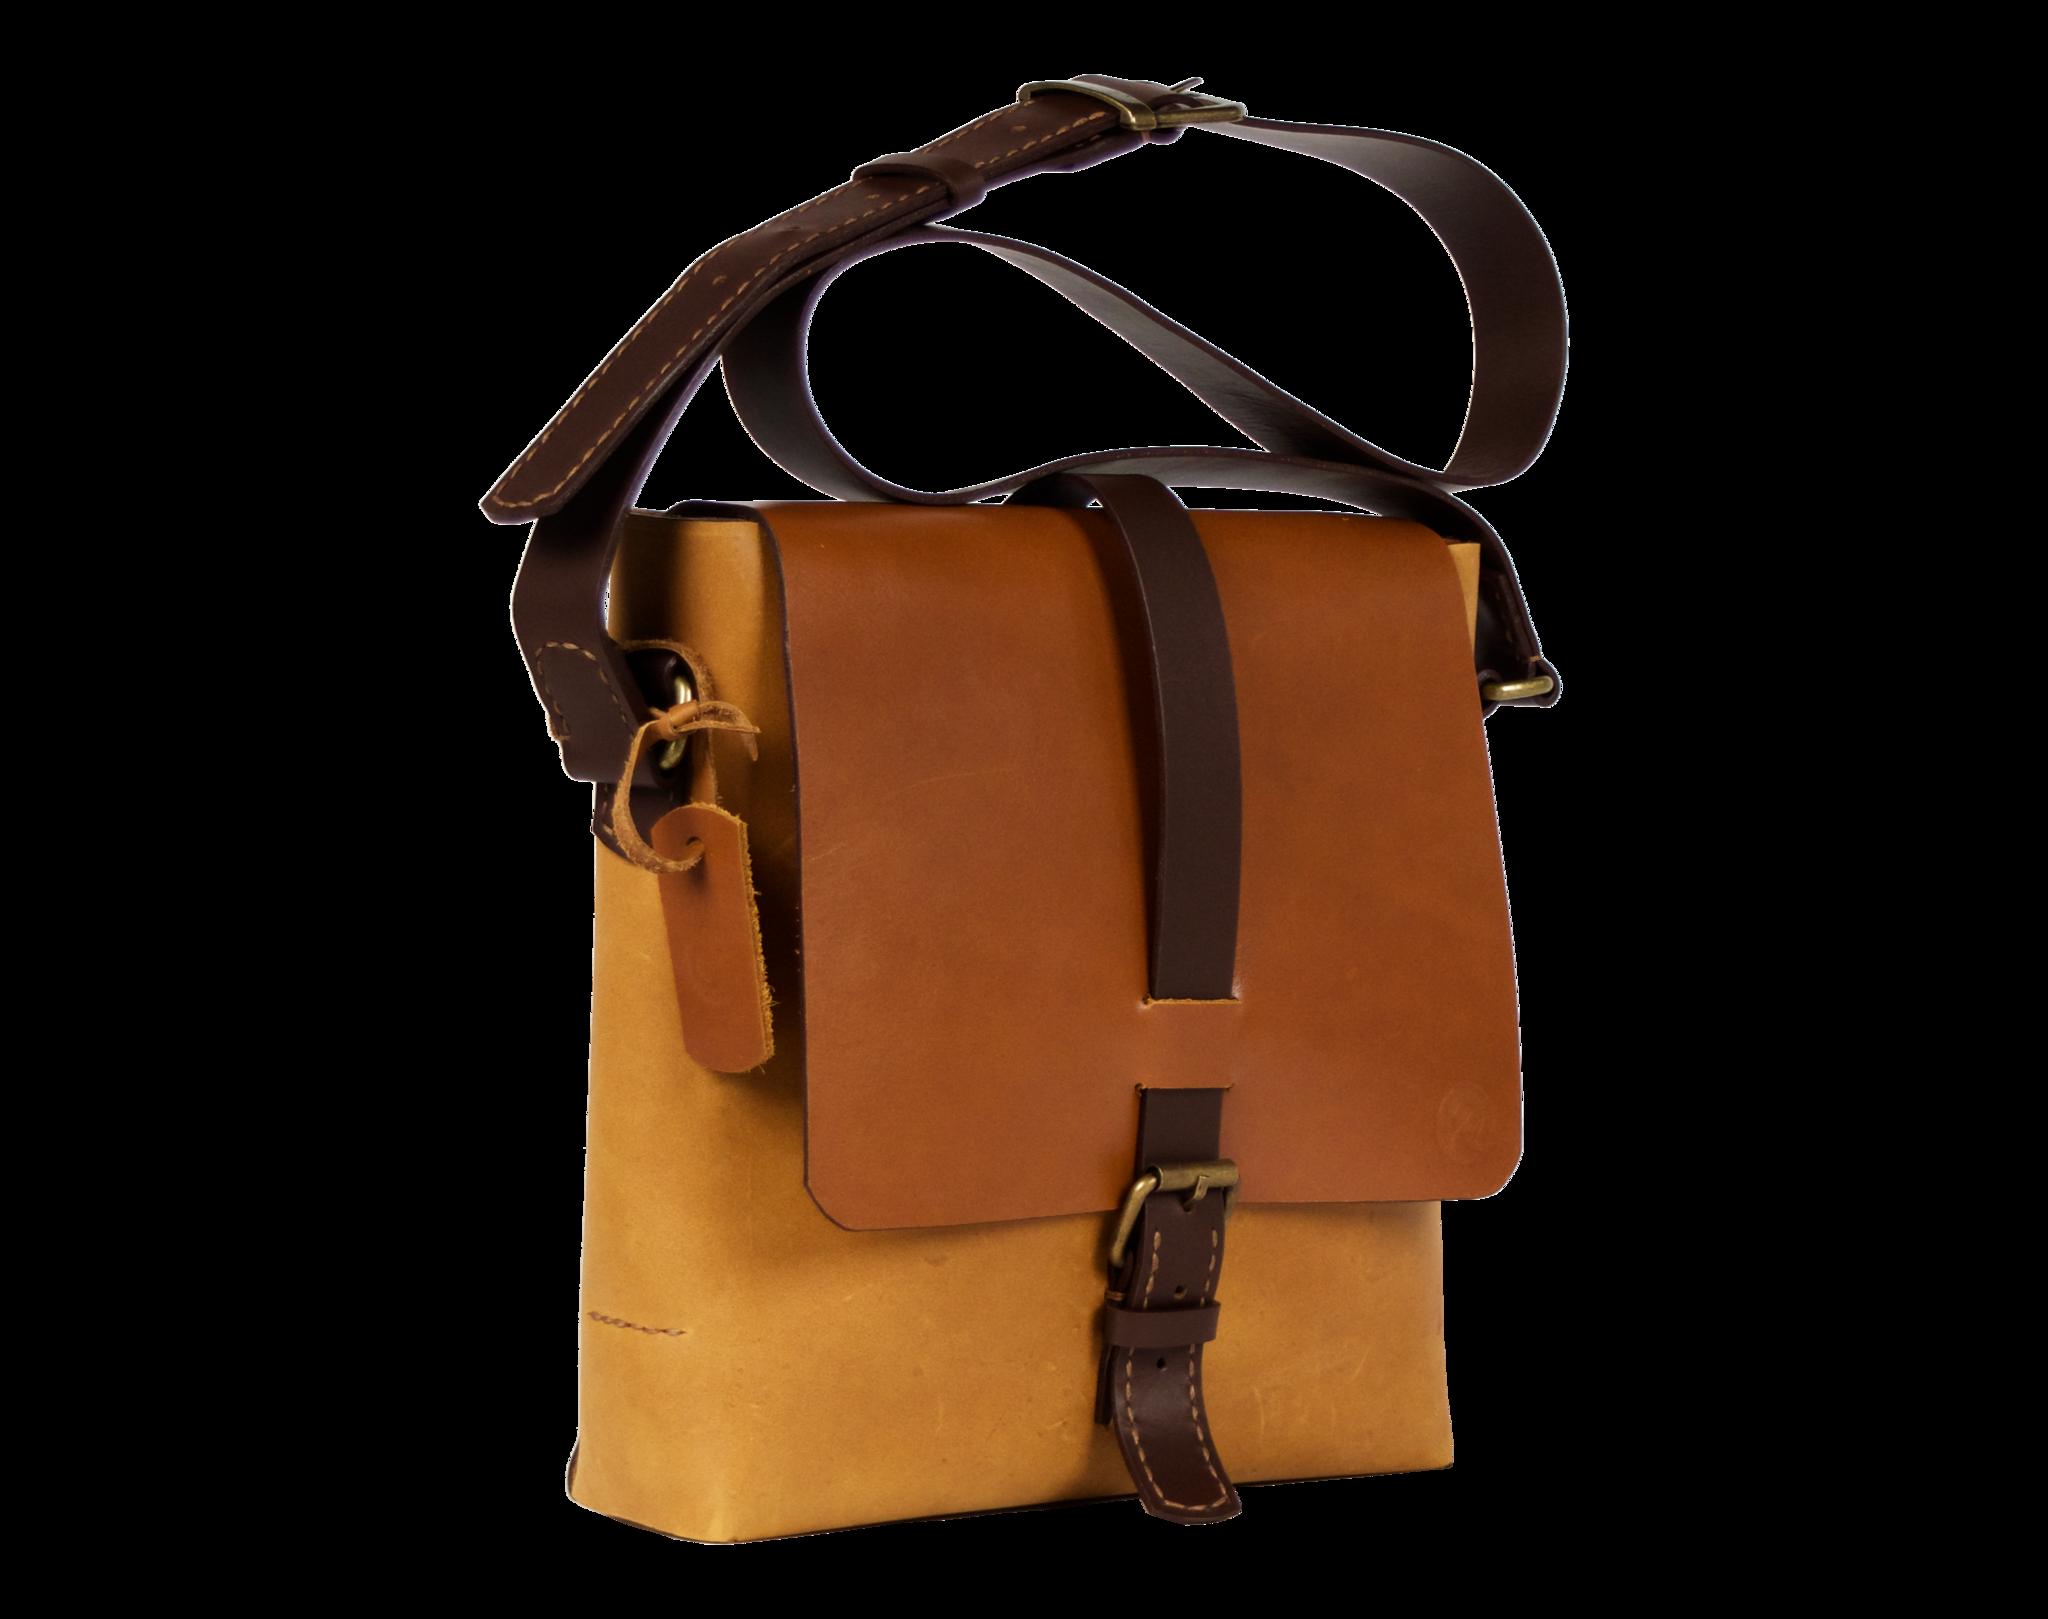 2048x1619 Loving Lab Handbag Accessory And Keychain Car Mirror Charm